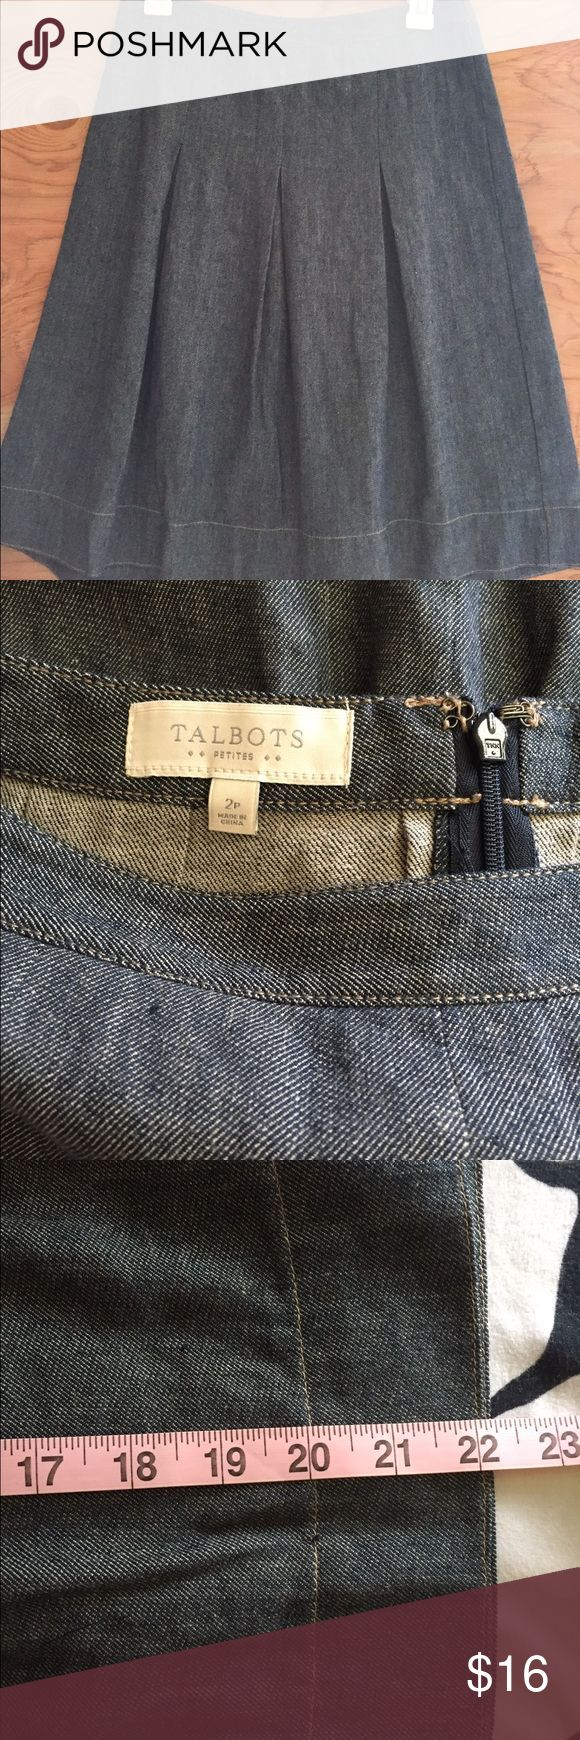 Talbots's petite skirt 57% linen 43% cotton in great condition. Talbots Skirts Midi